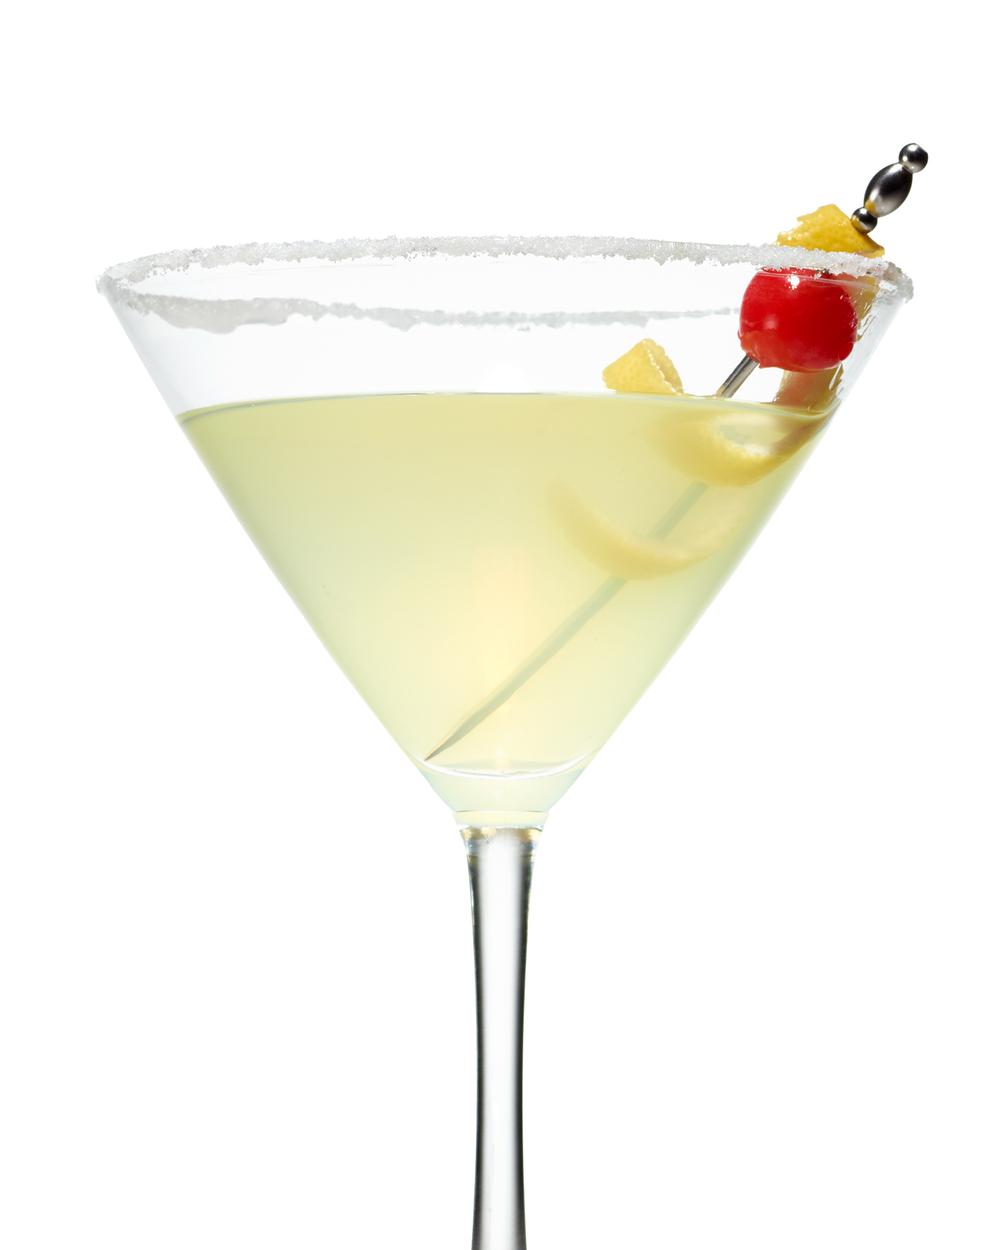 lemon_drop_lemon_drop_martini_0669rt_crop.jpg